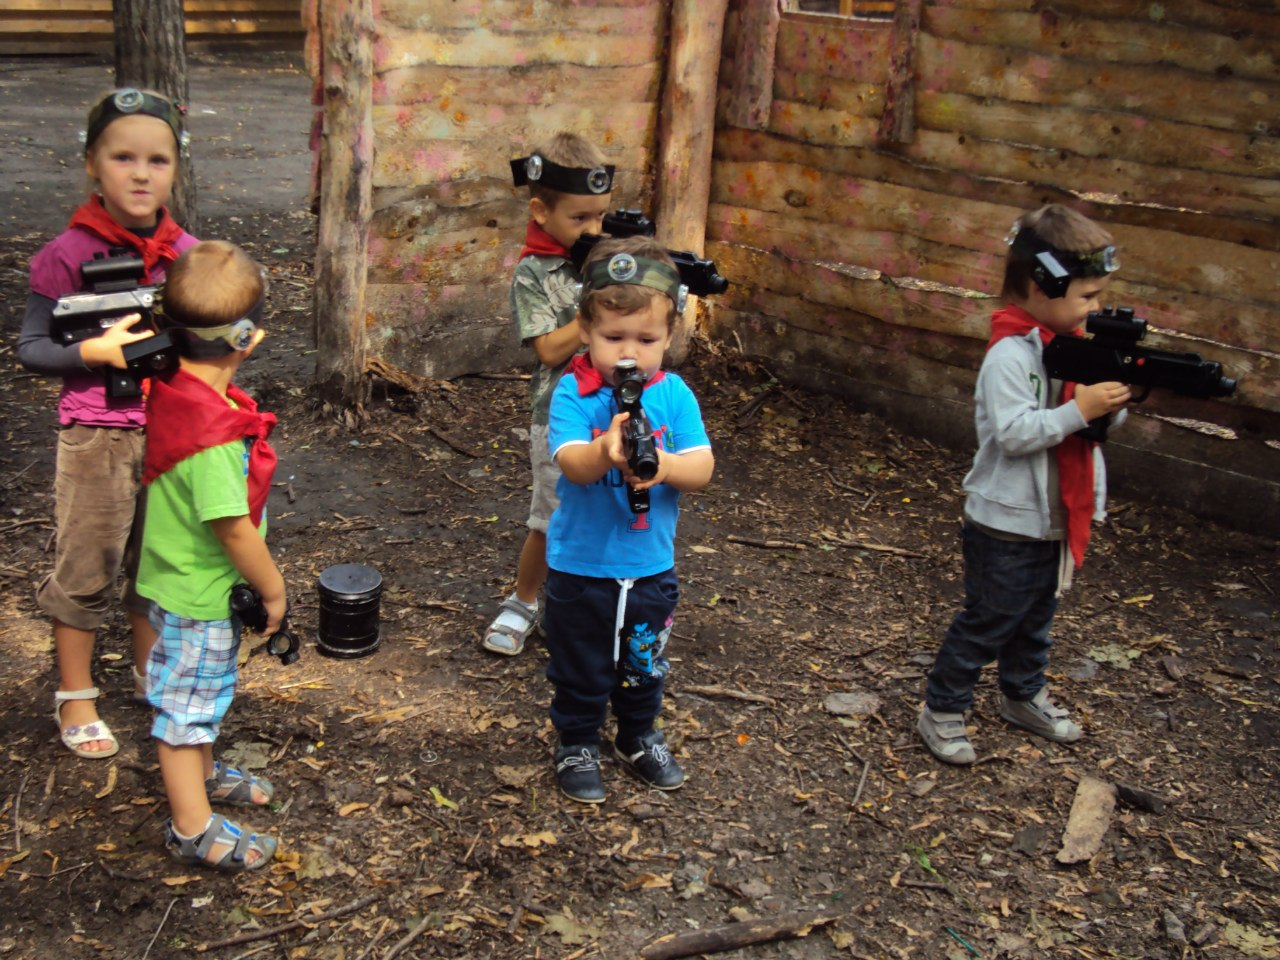 лазертаг фото дети